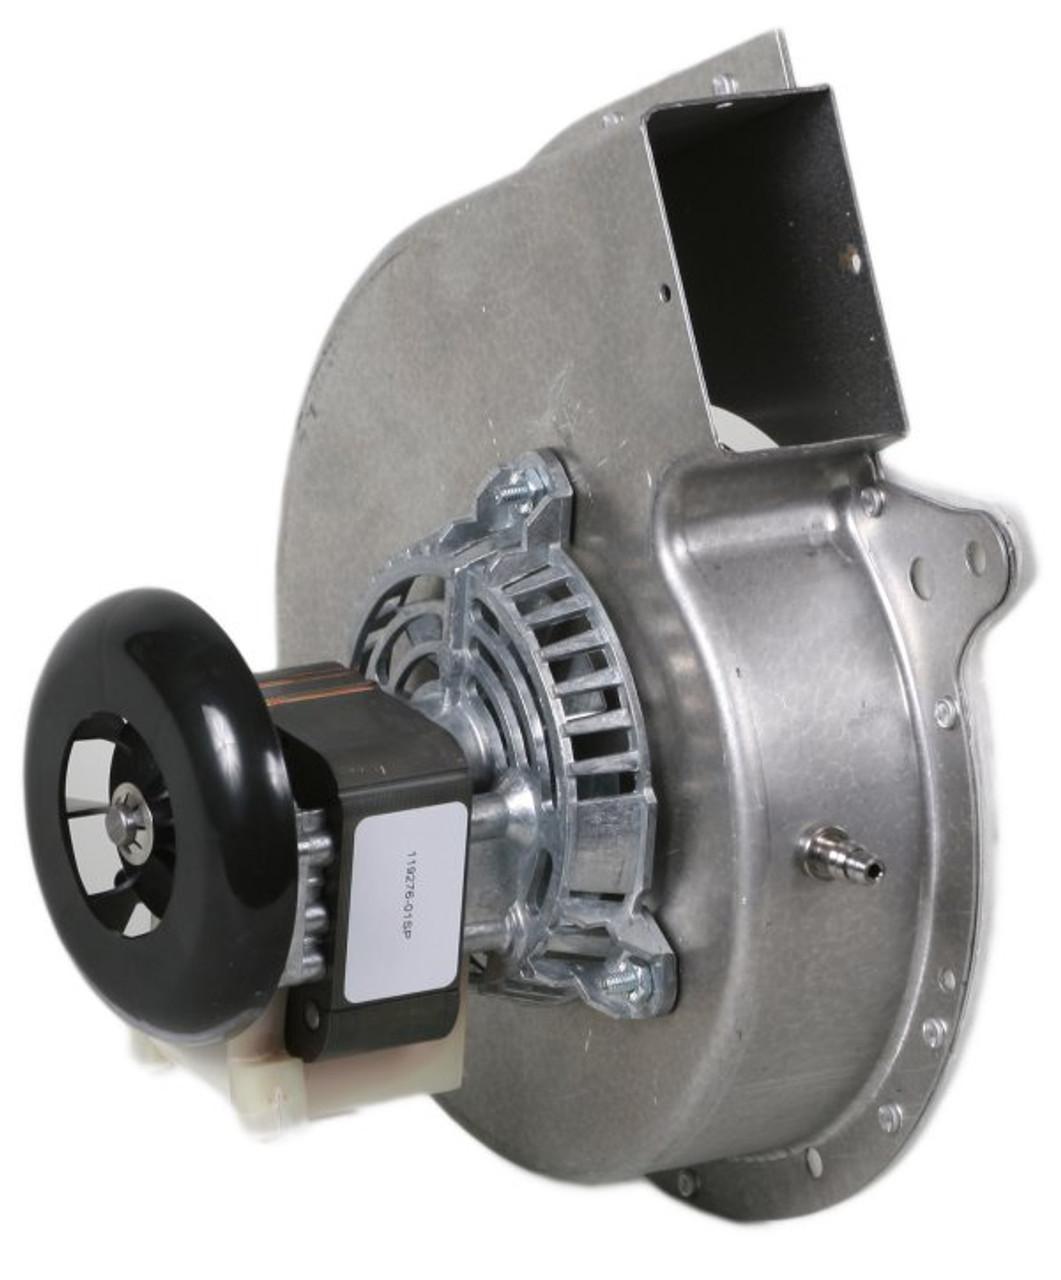 Goodman Furnace Draft Inducer Blower 115v 0131m00002p B40590 03